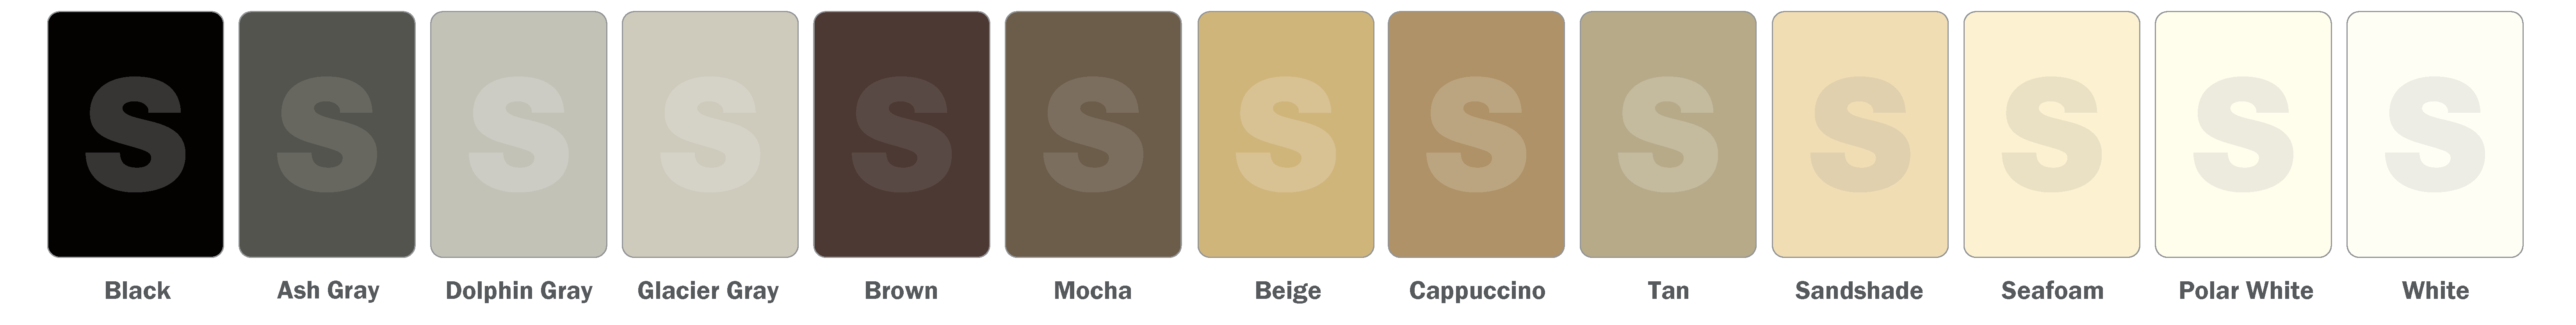 SIMONA Available Colors